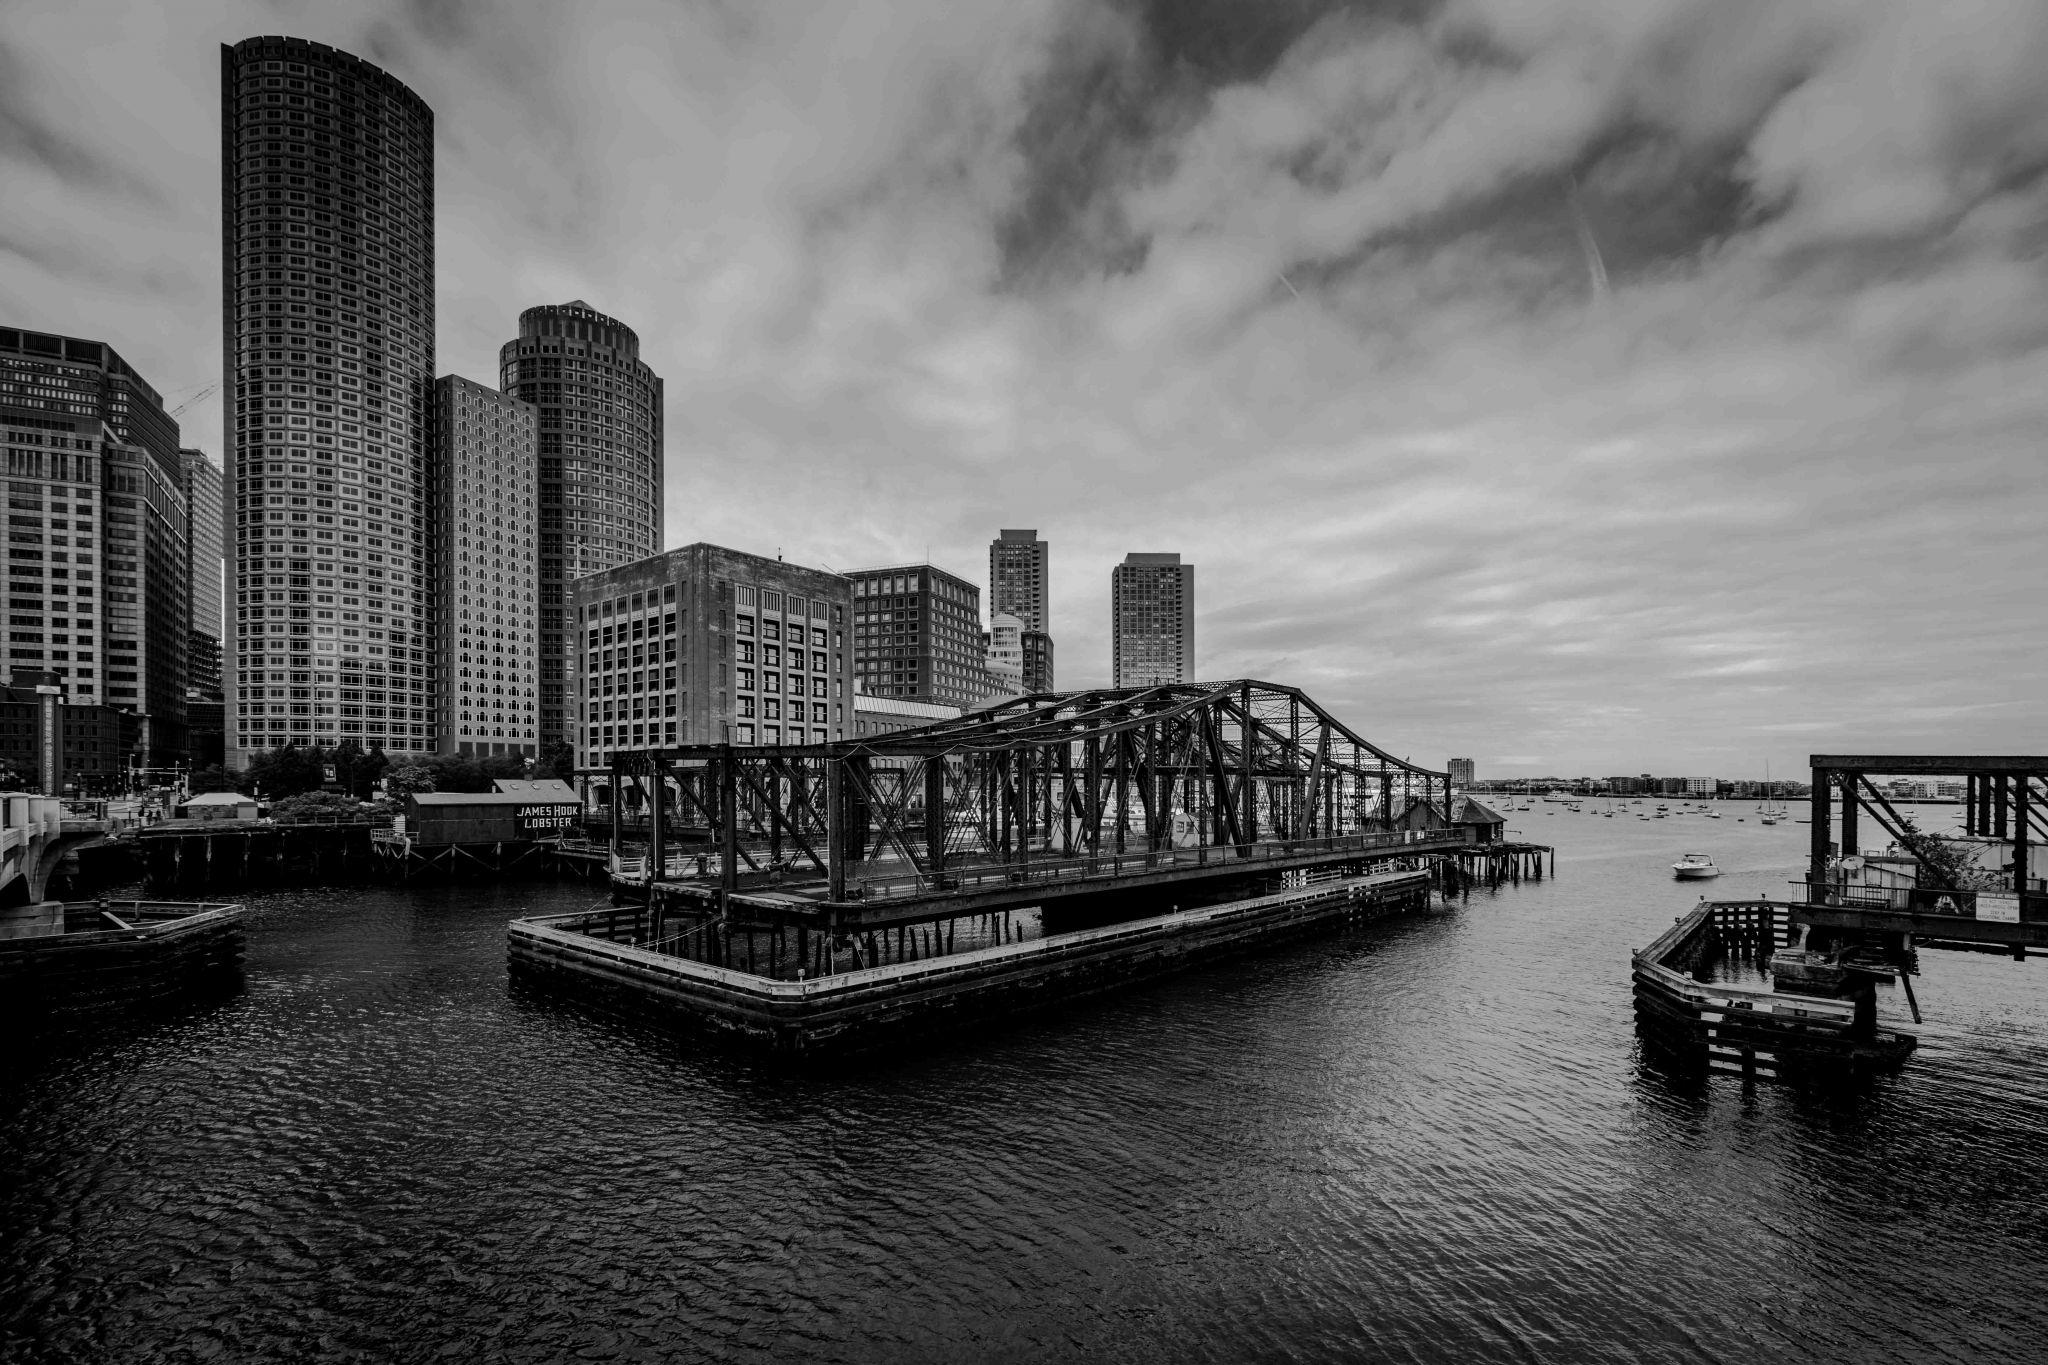 Old Northern Ave Bridge & skyline Boston, USA